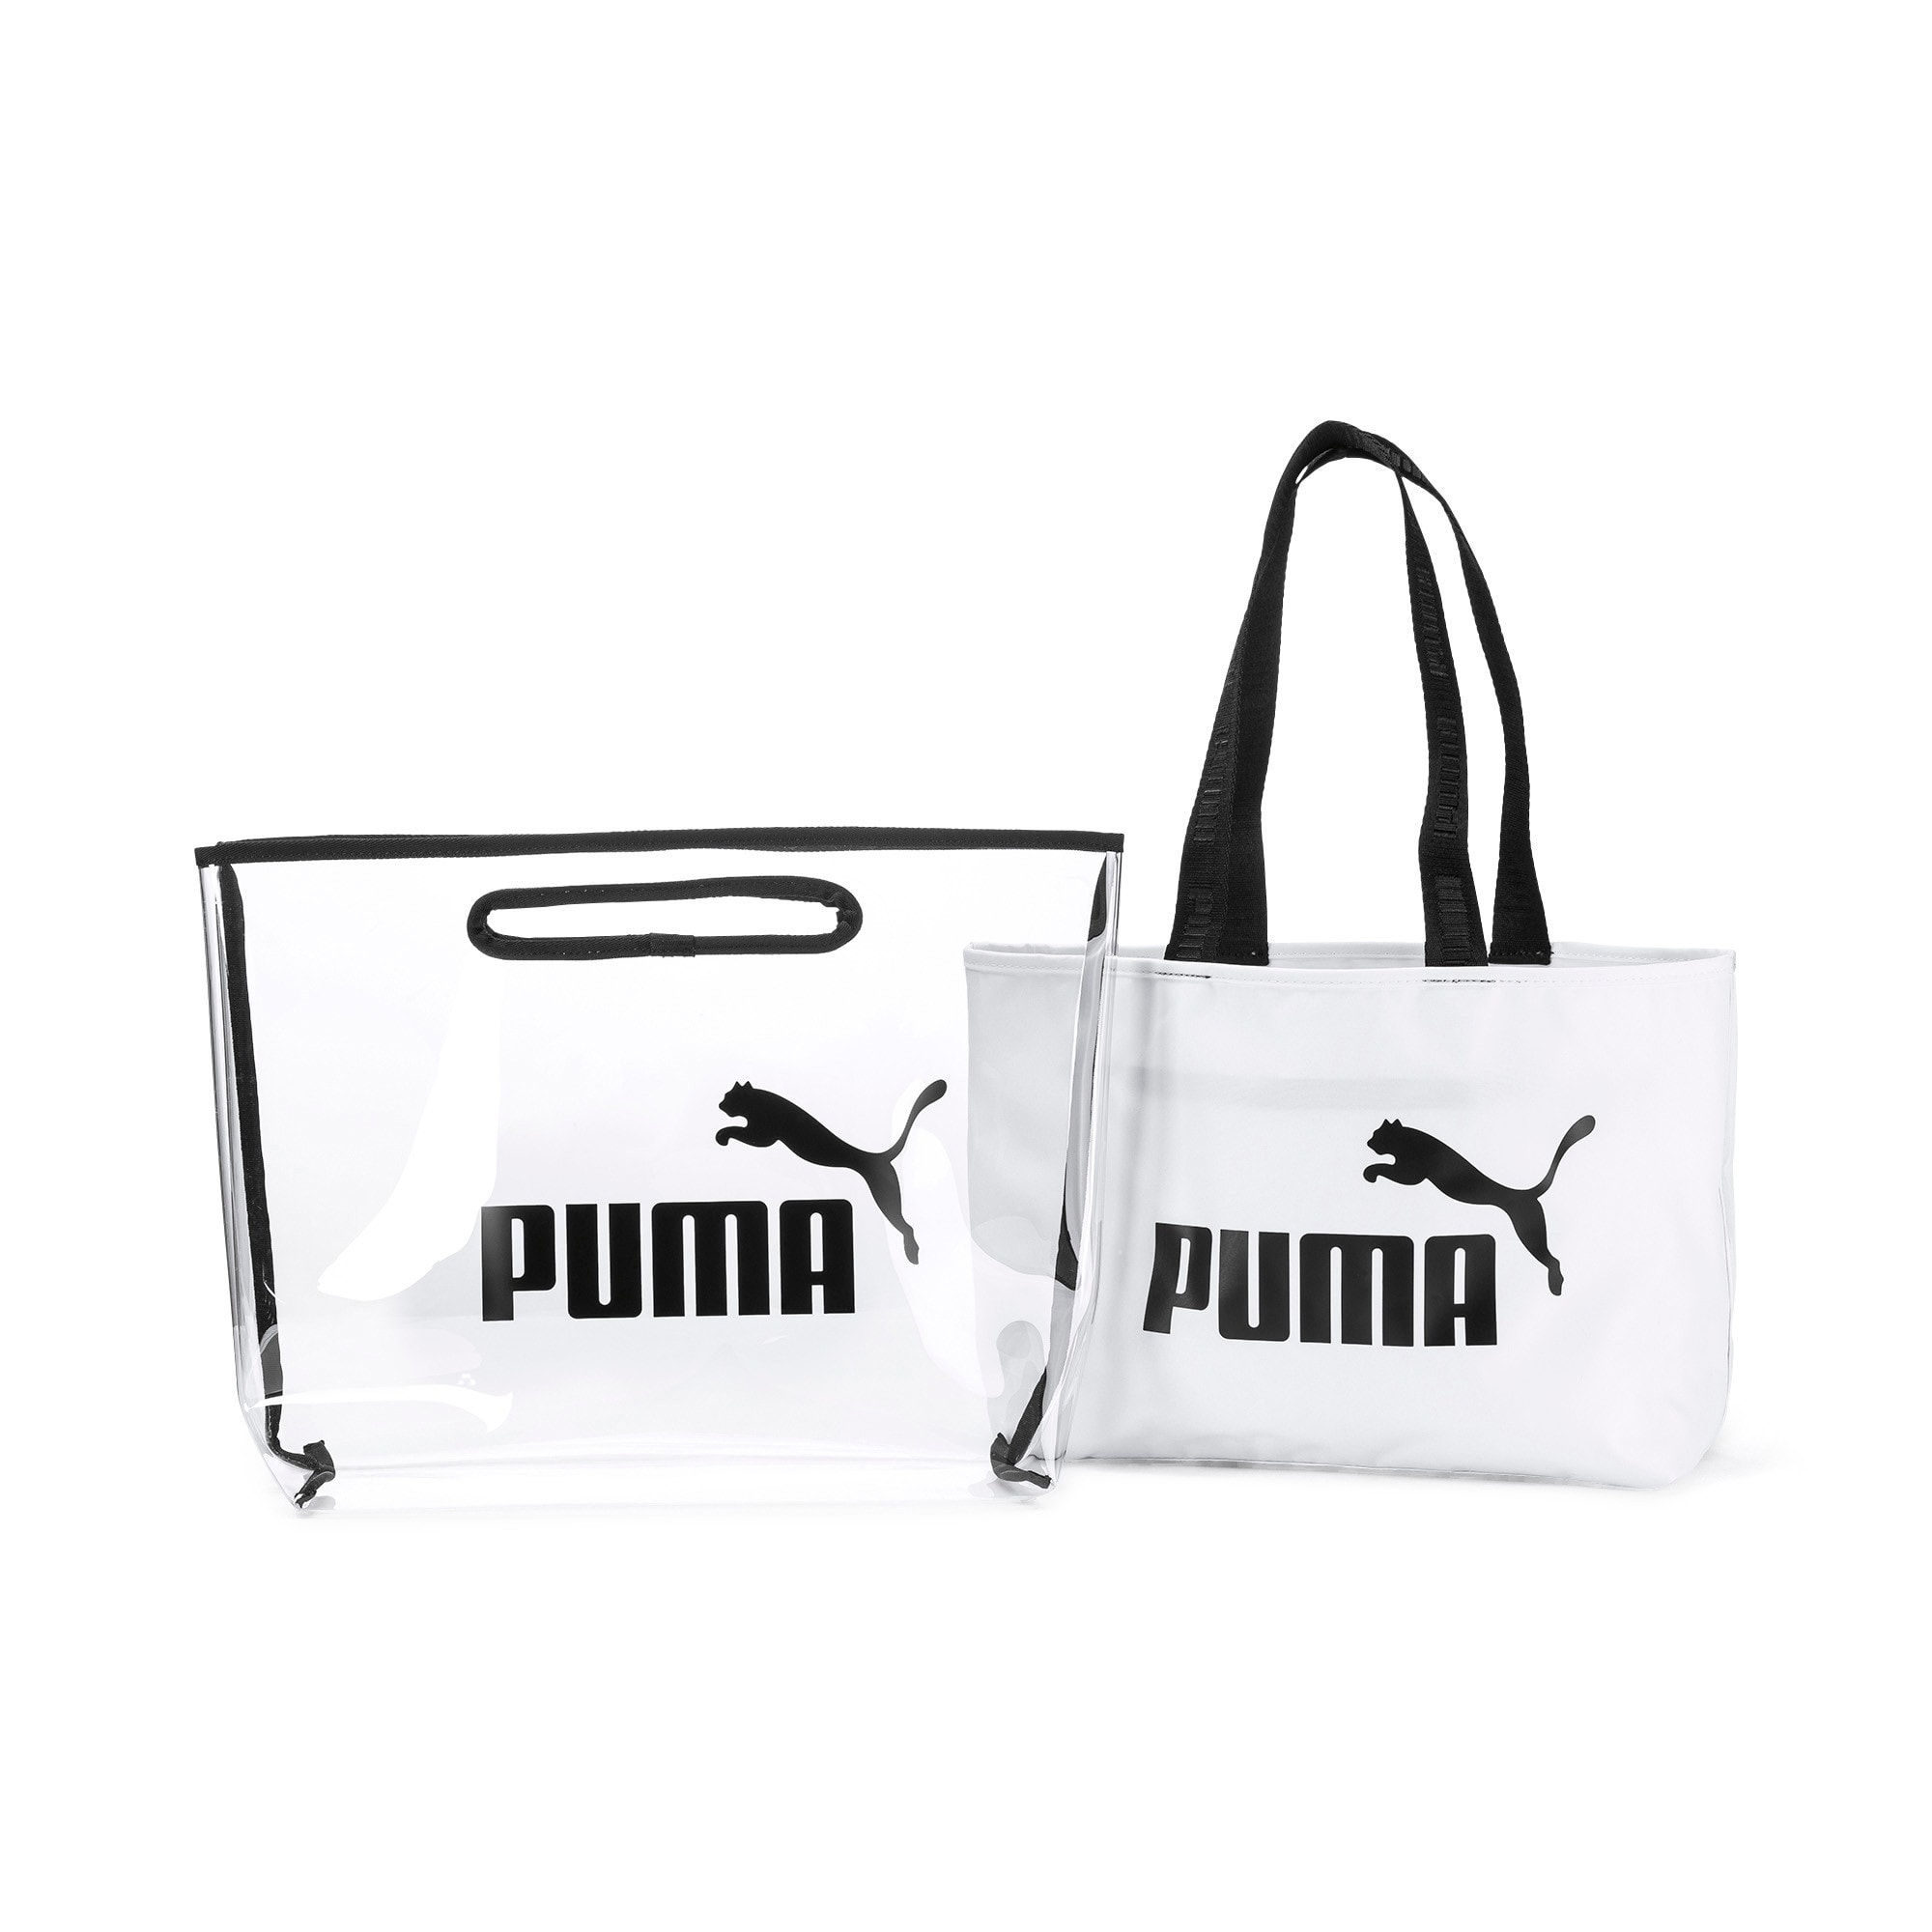 Thumbnail 3 of Damen Twin Shopper, Puma White, medium